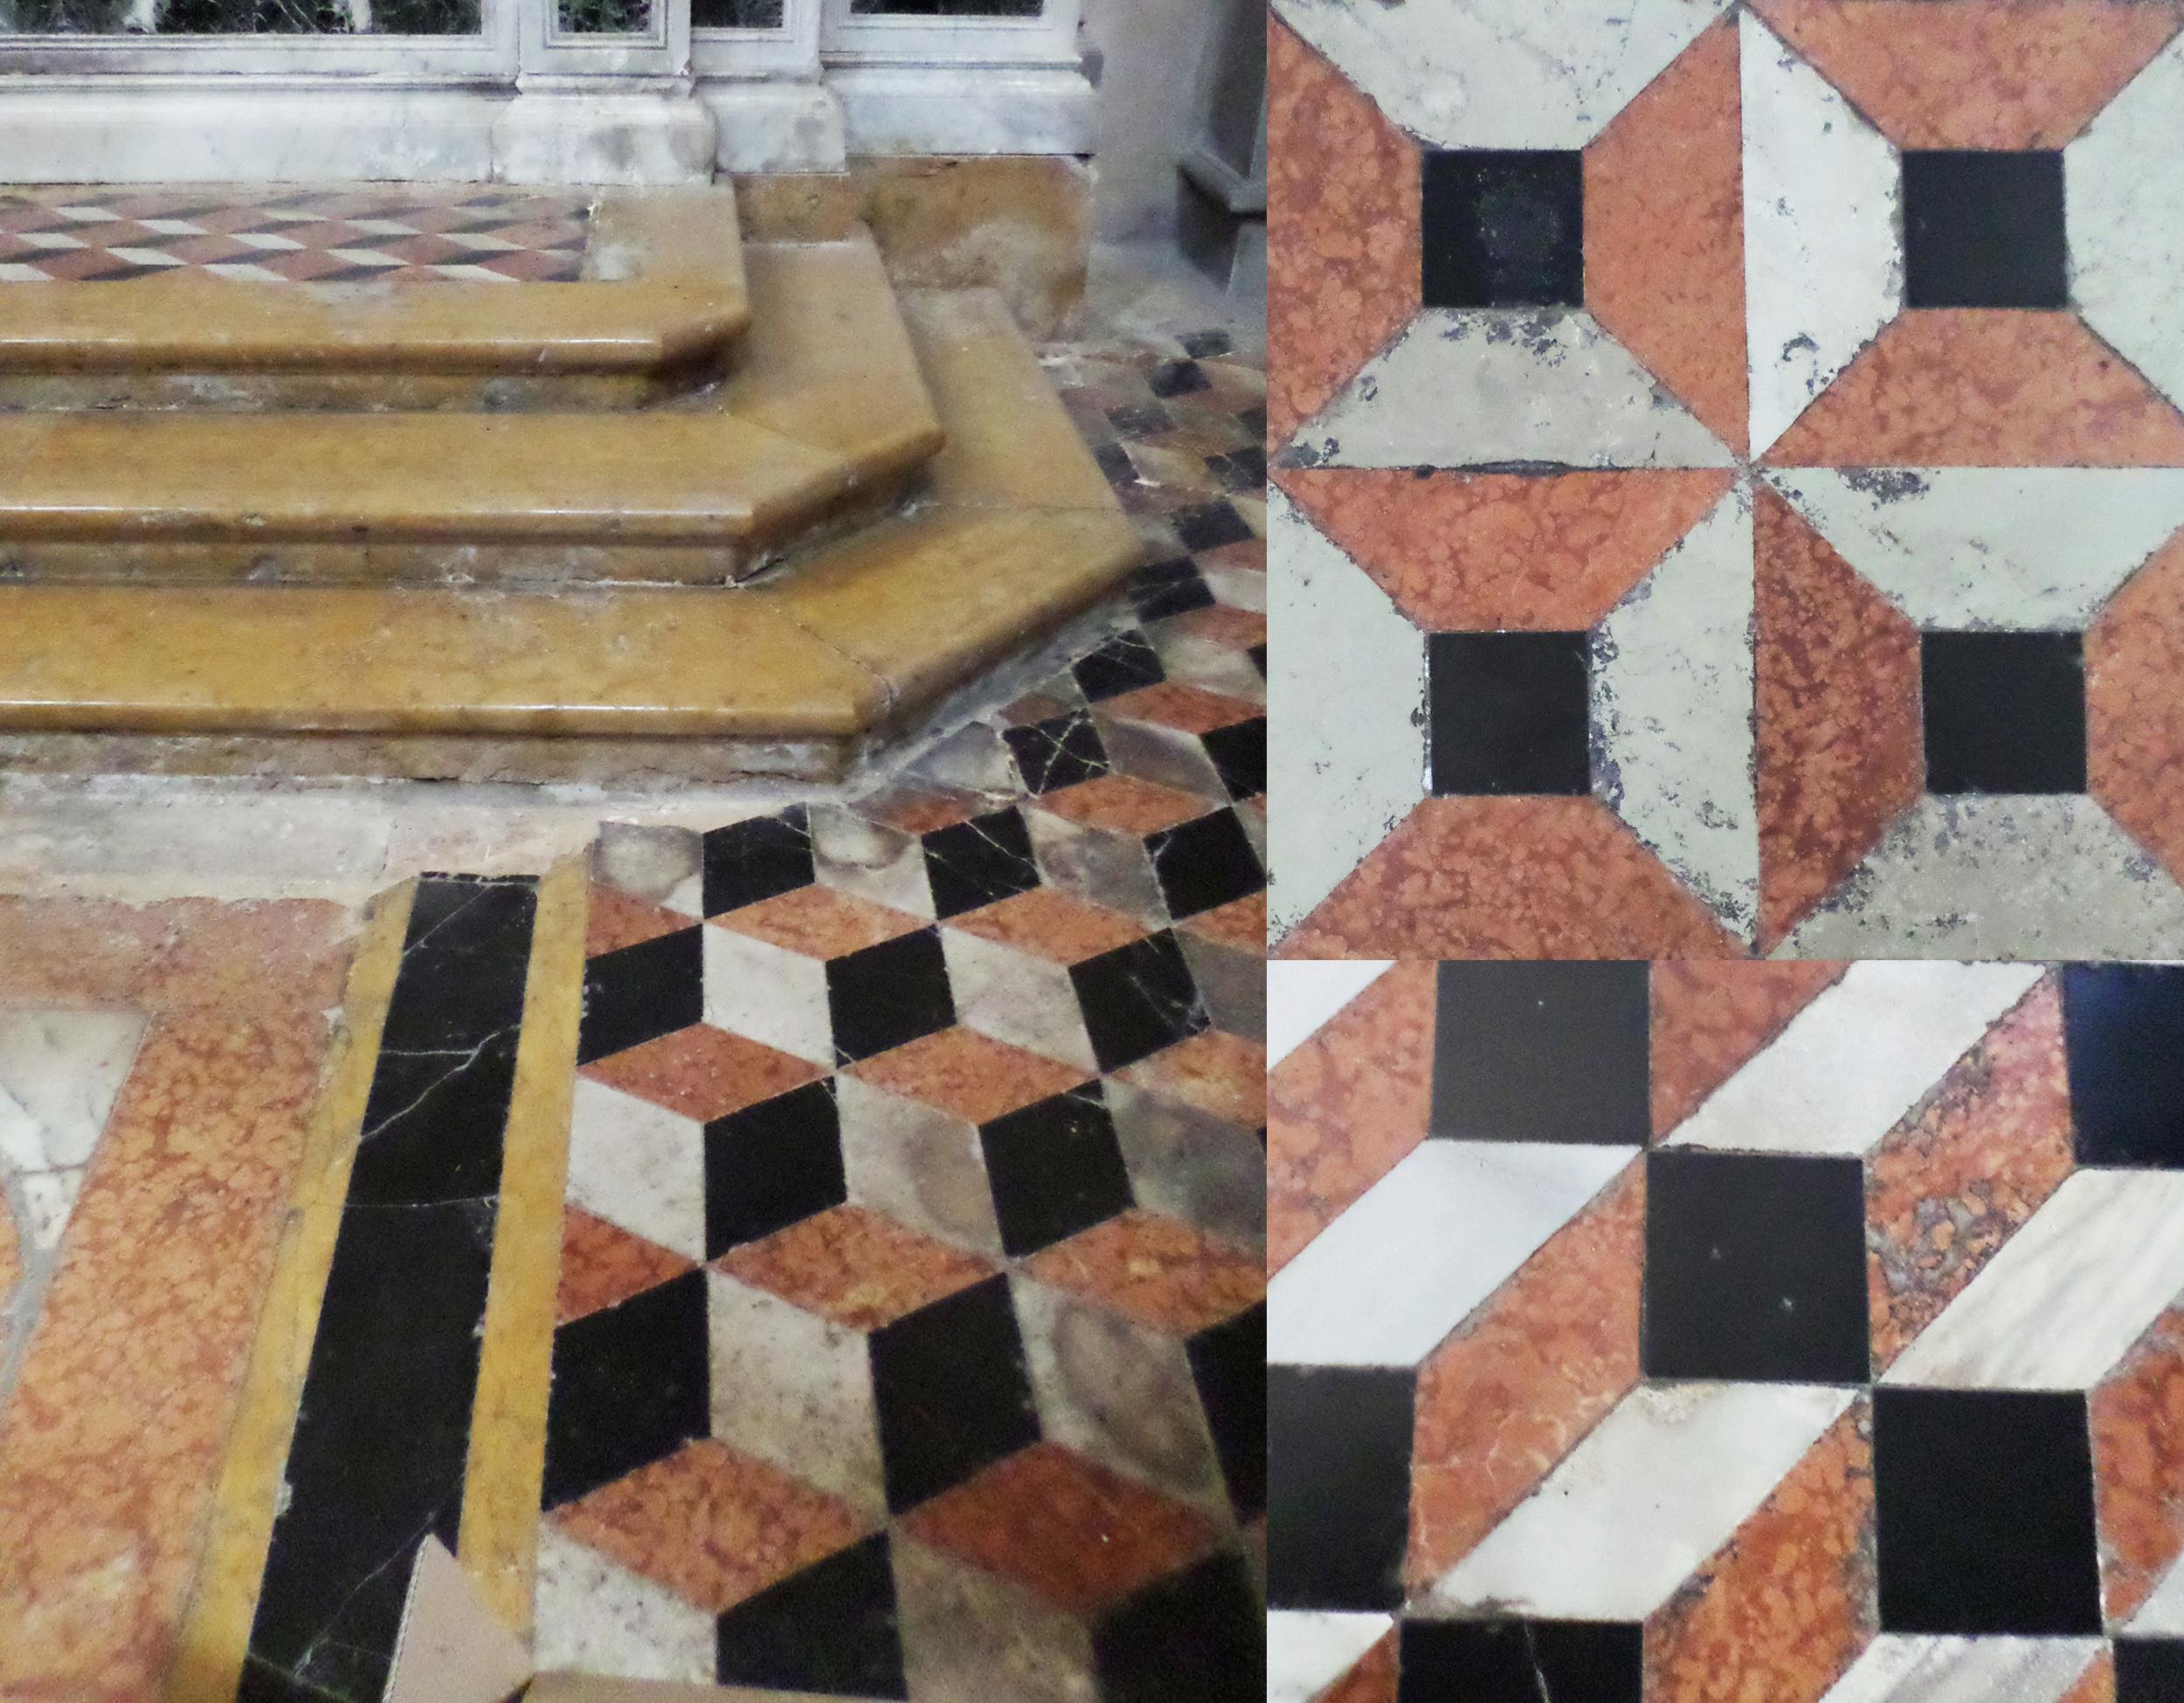 marble floors in Venetian churches